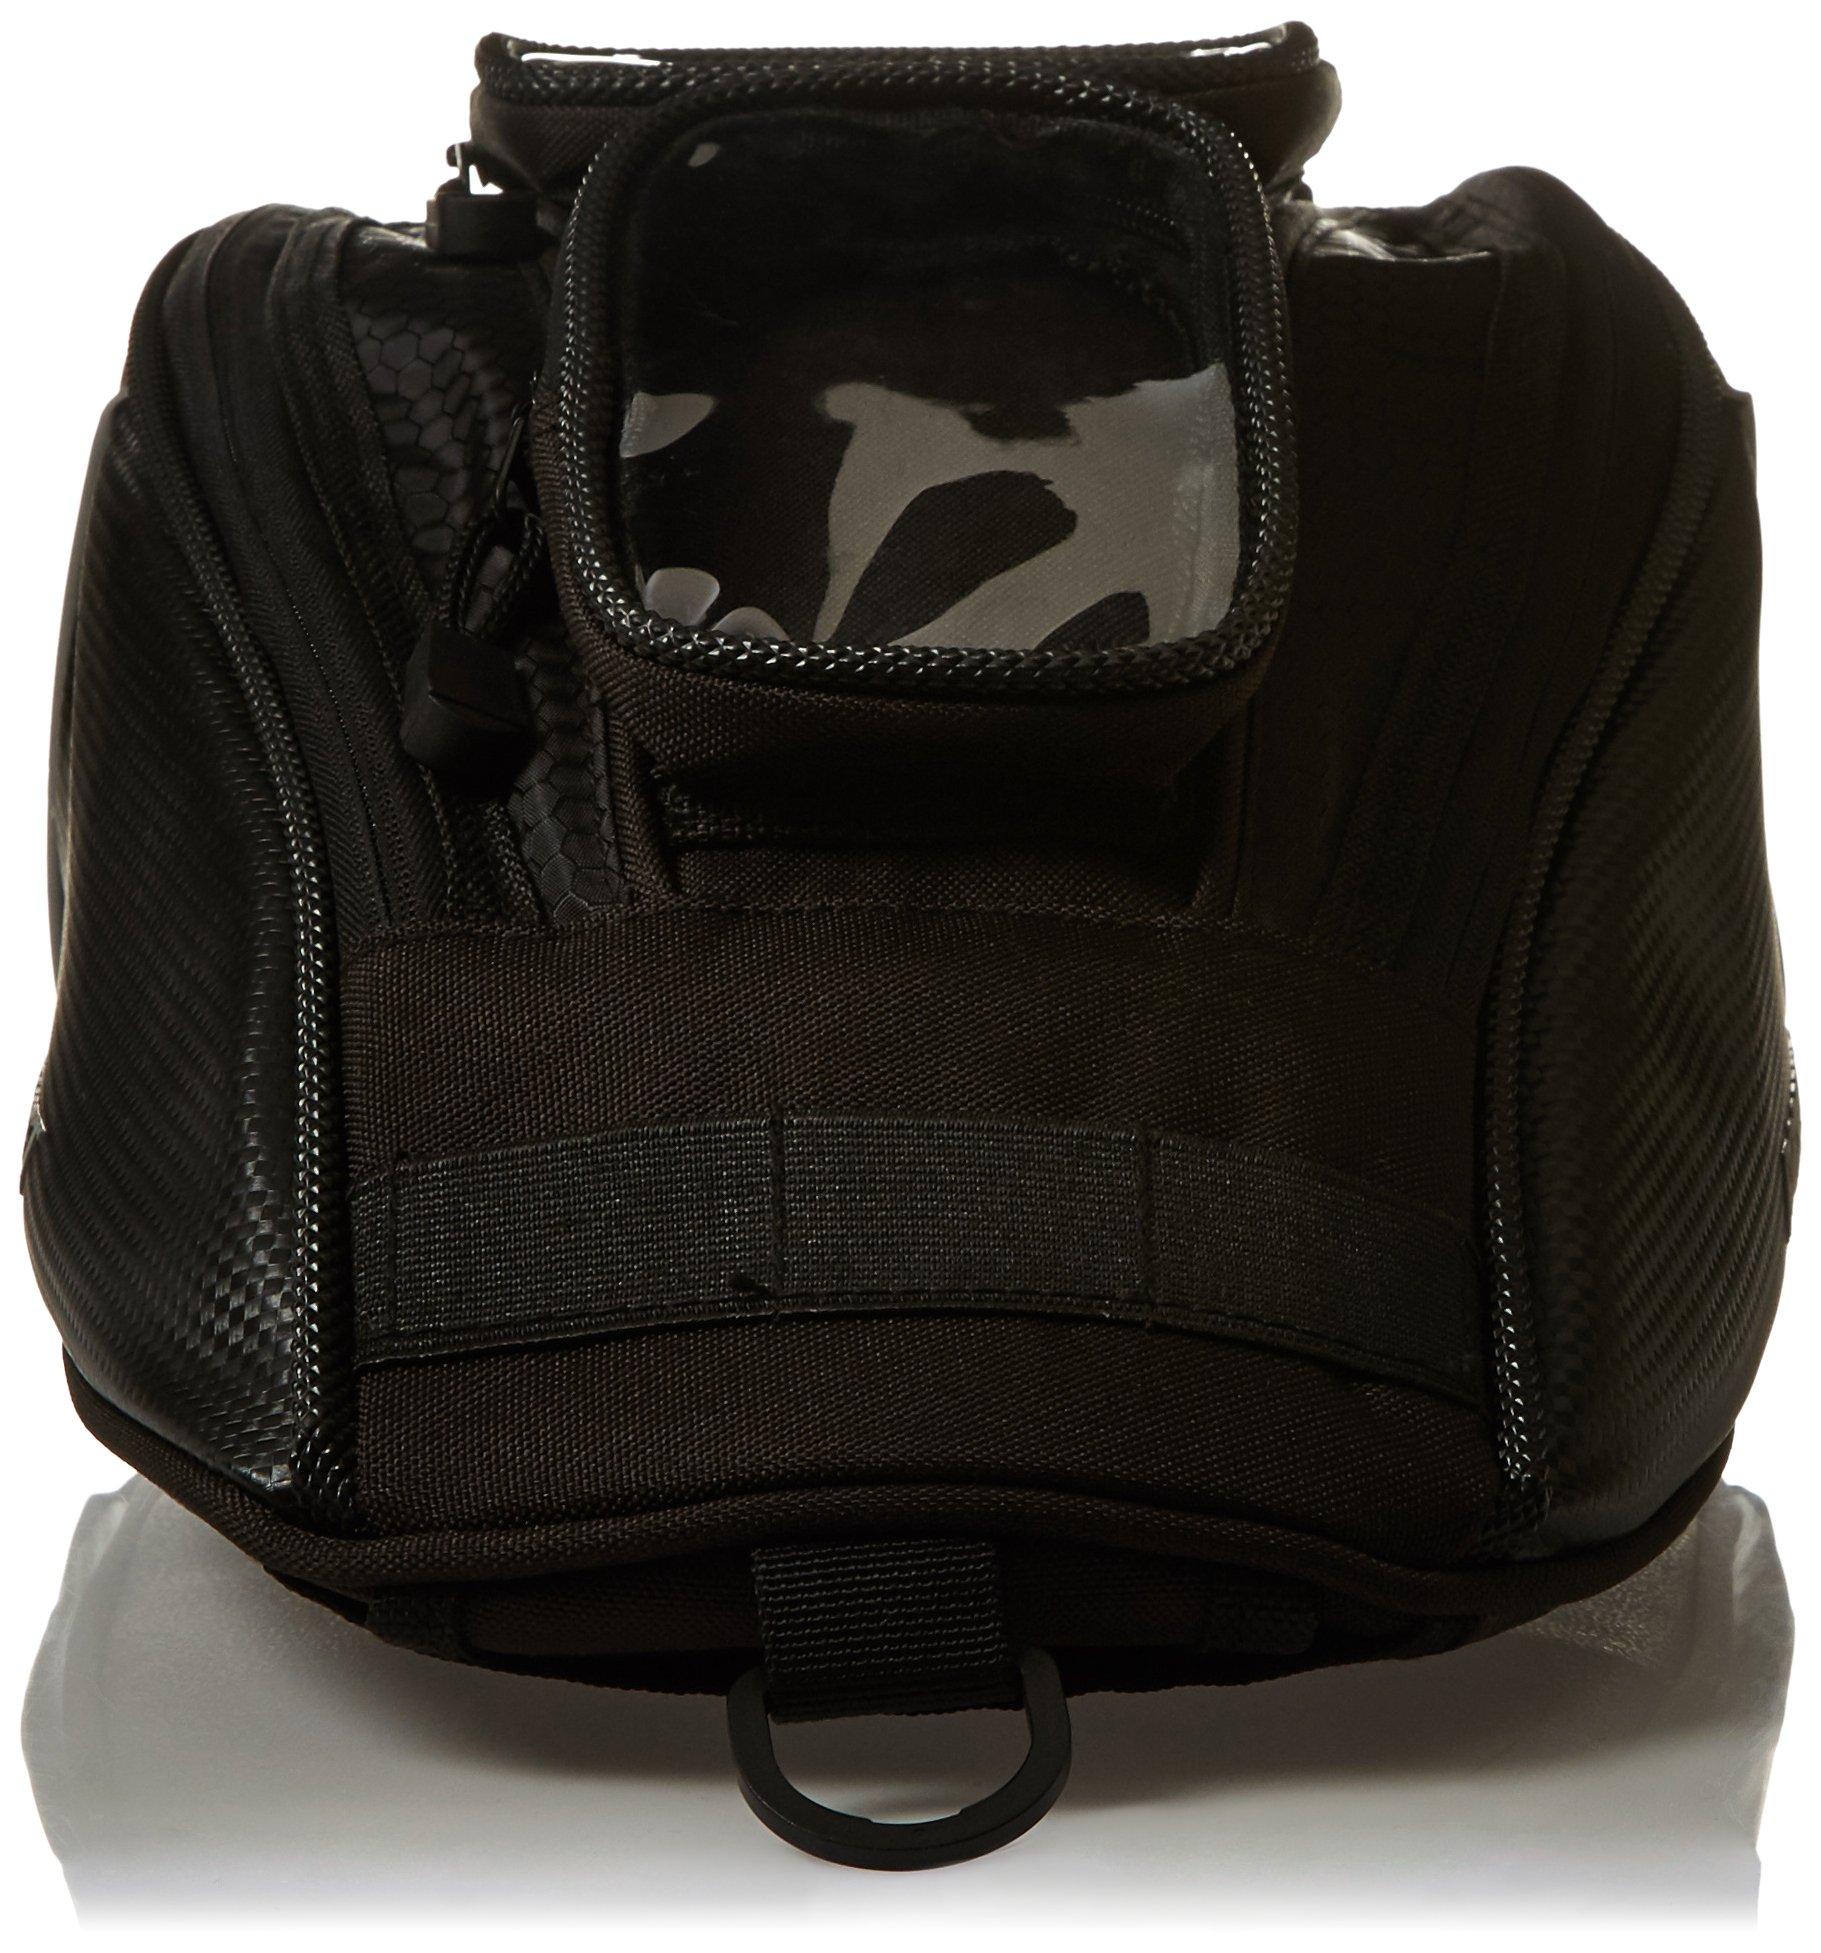 Joe Rocket 9059-0800 Hammerhead Black/Carbon 15'' x 8'' x 5'' Motorcycle Tank Bag